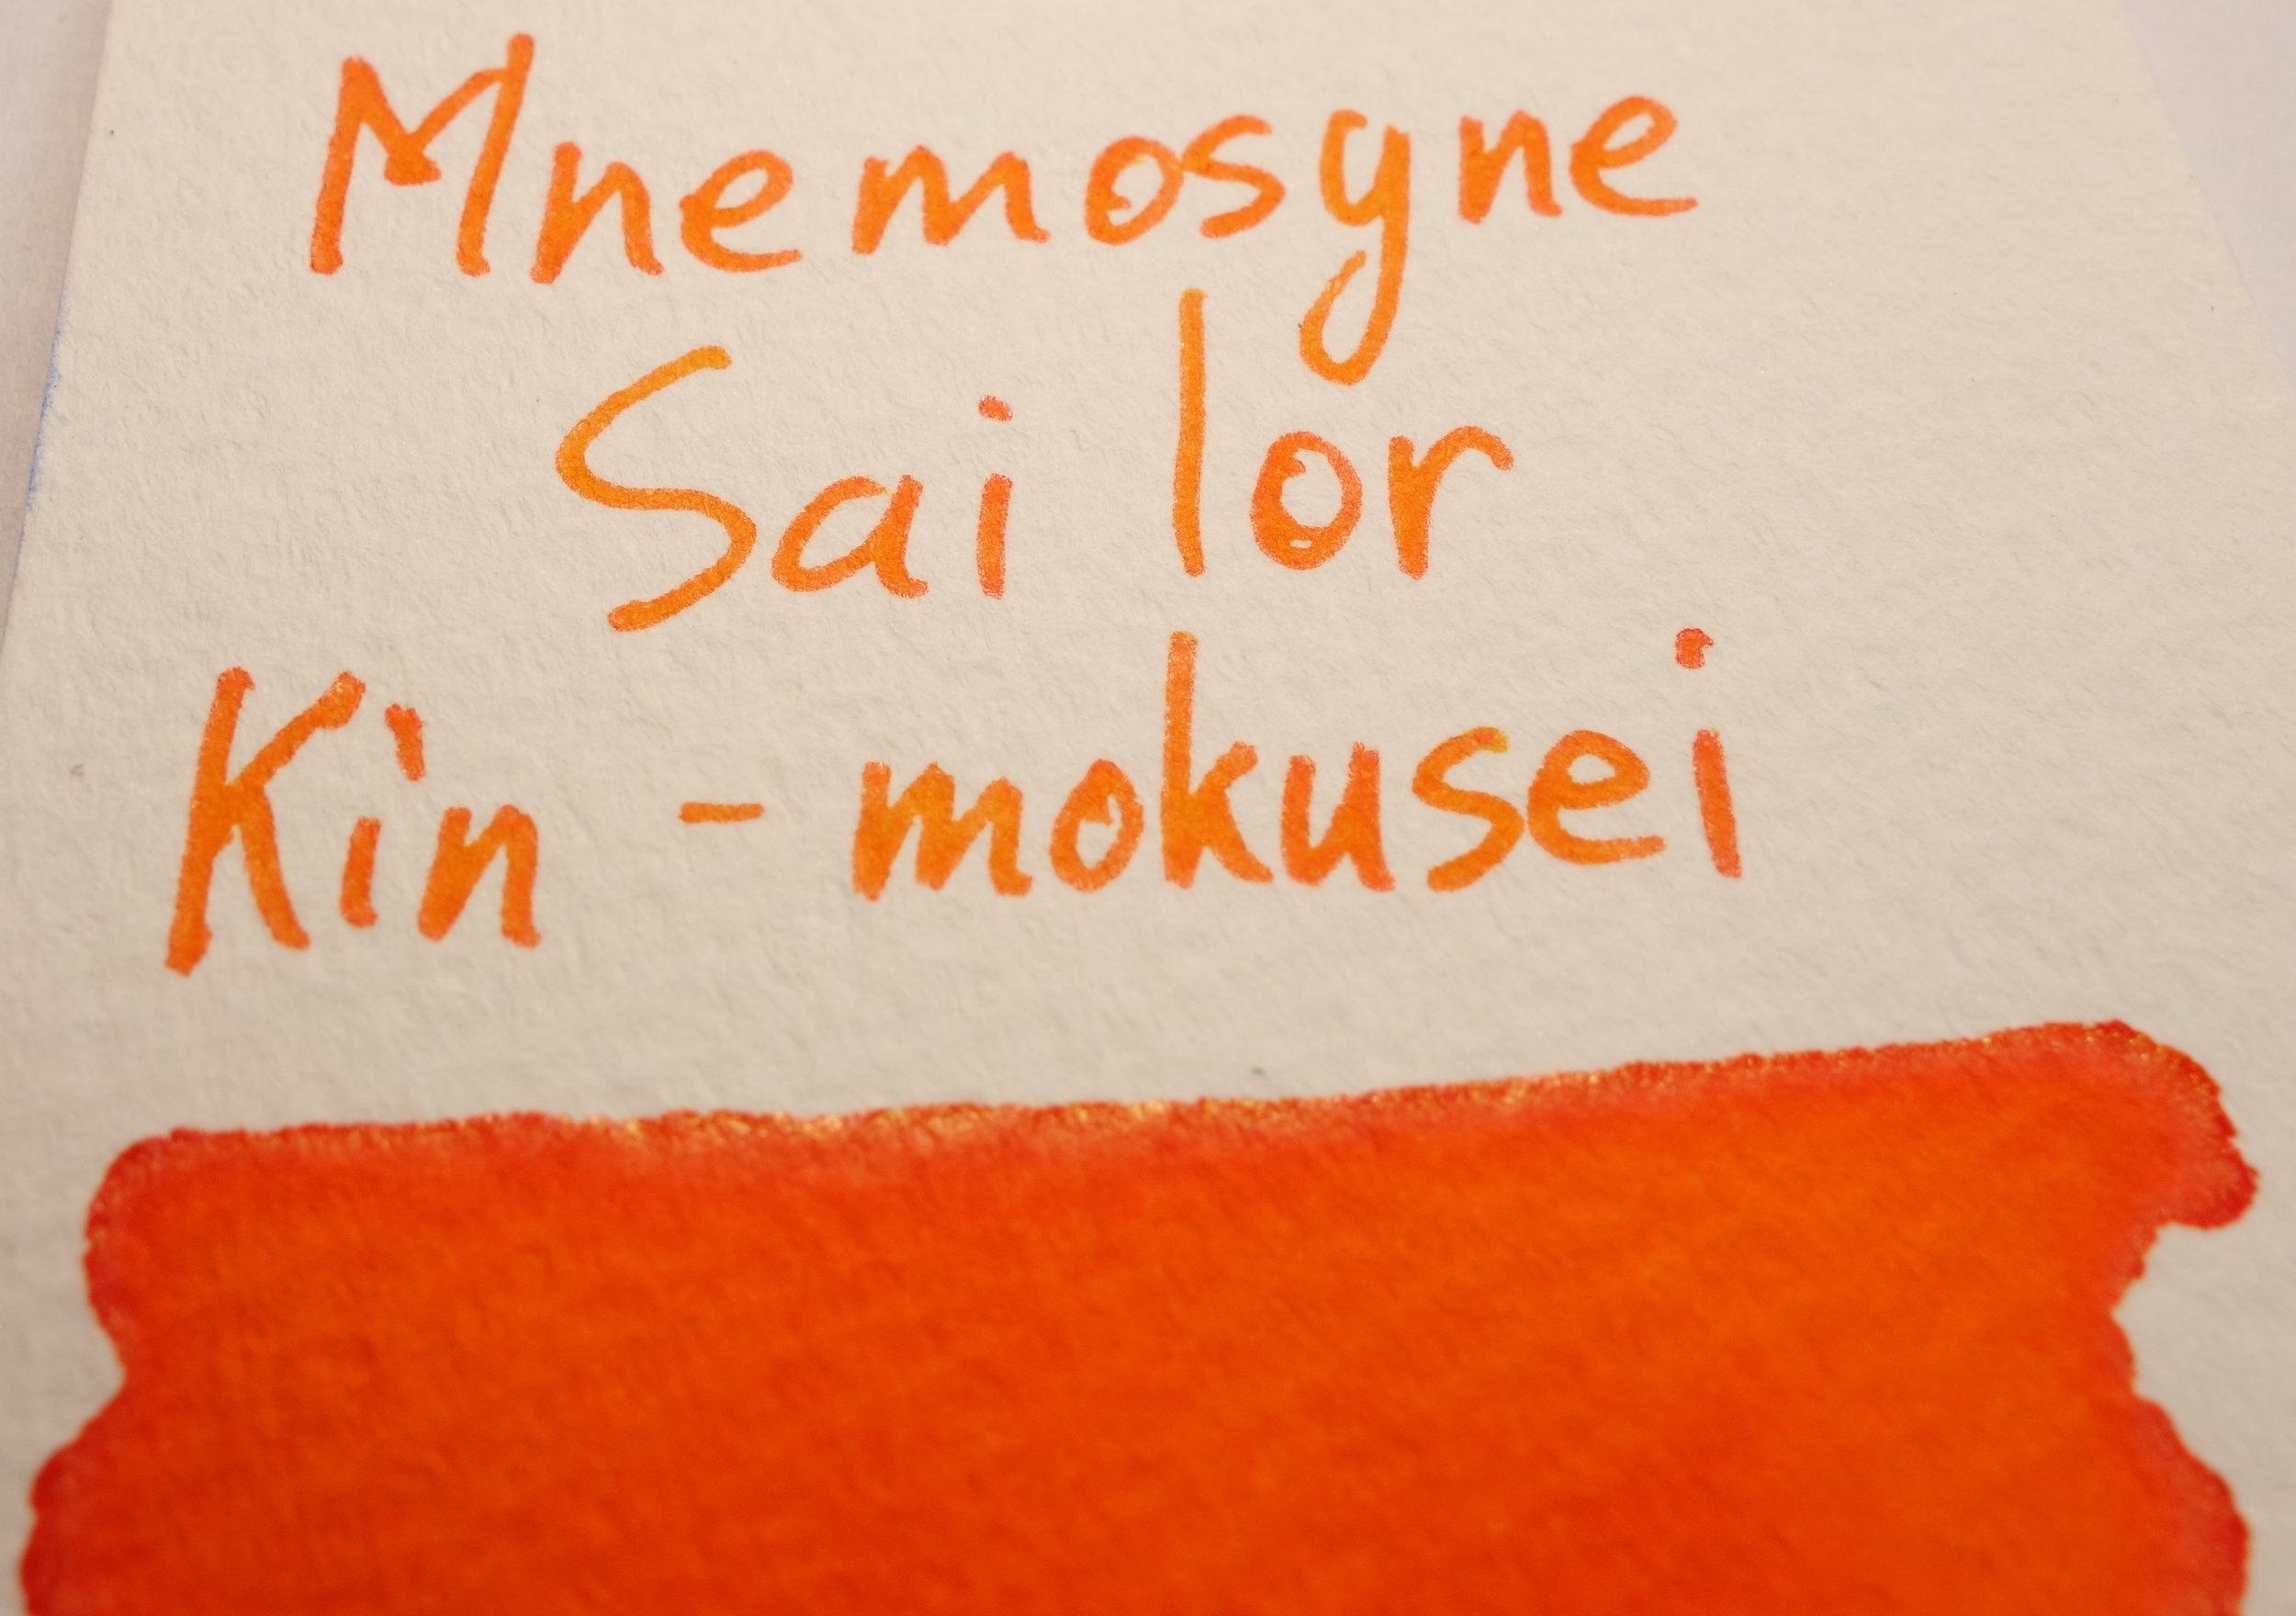 Sailor Kin-mokusei Sheen Mnemosyne.JPG